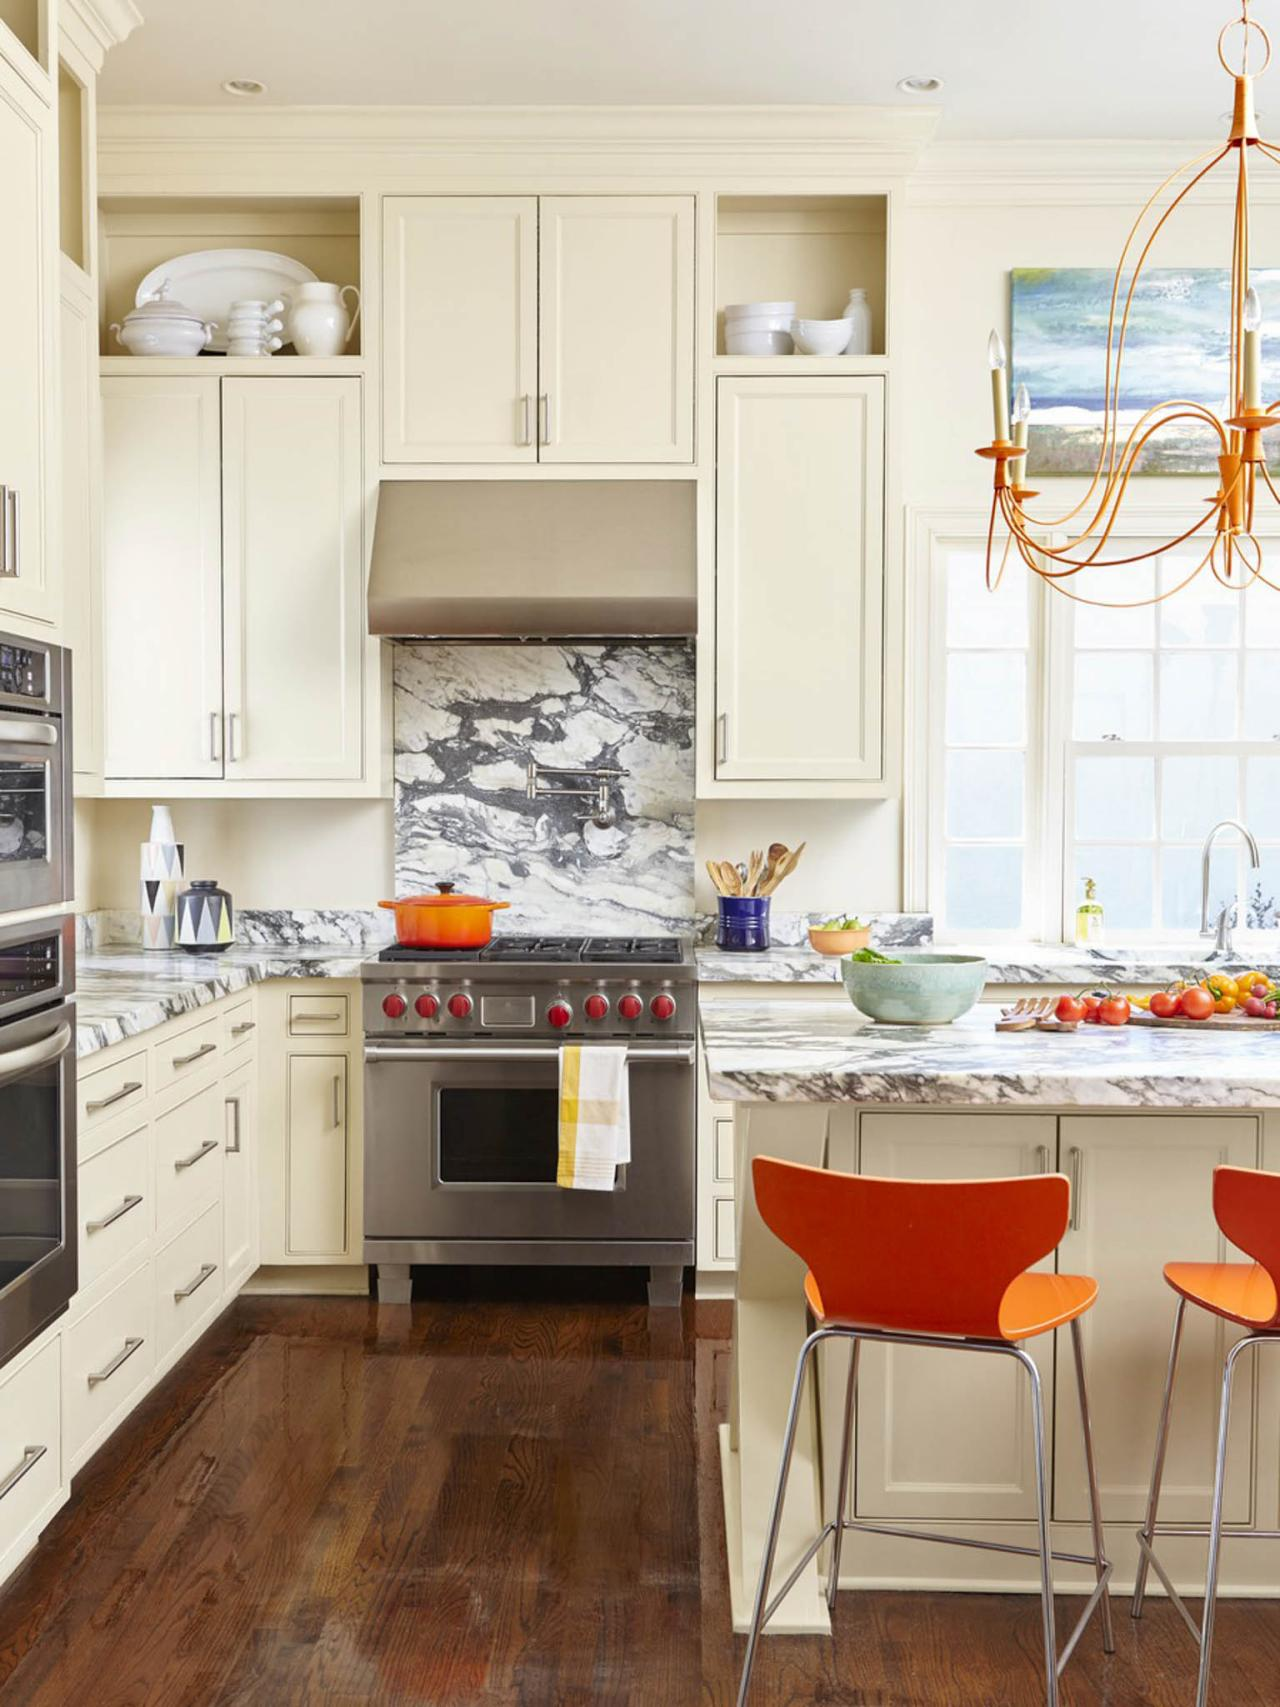 Кухня цвета ванили со шкафчиками